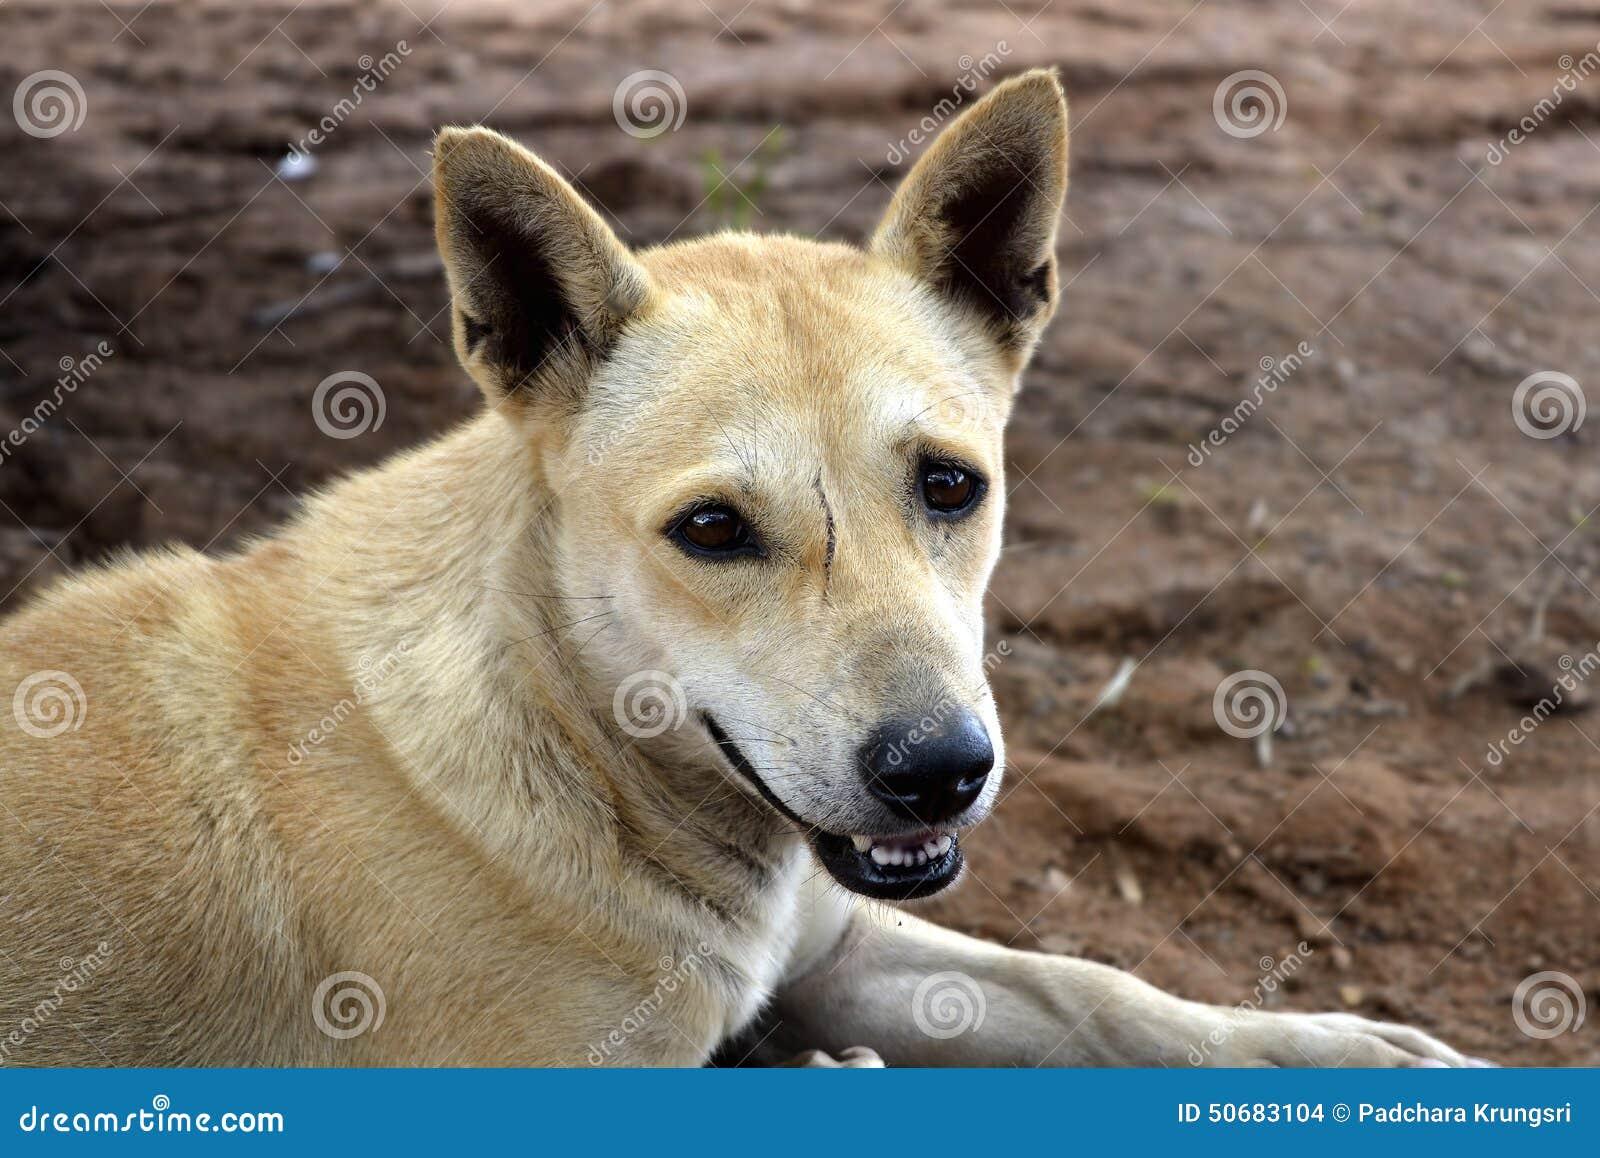 Download 丑恶的scae具有的狗 库存照片. 图片 包括有 草甸, 人力, beauvoir, 健康, 孩子, 自然 - 50683104